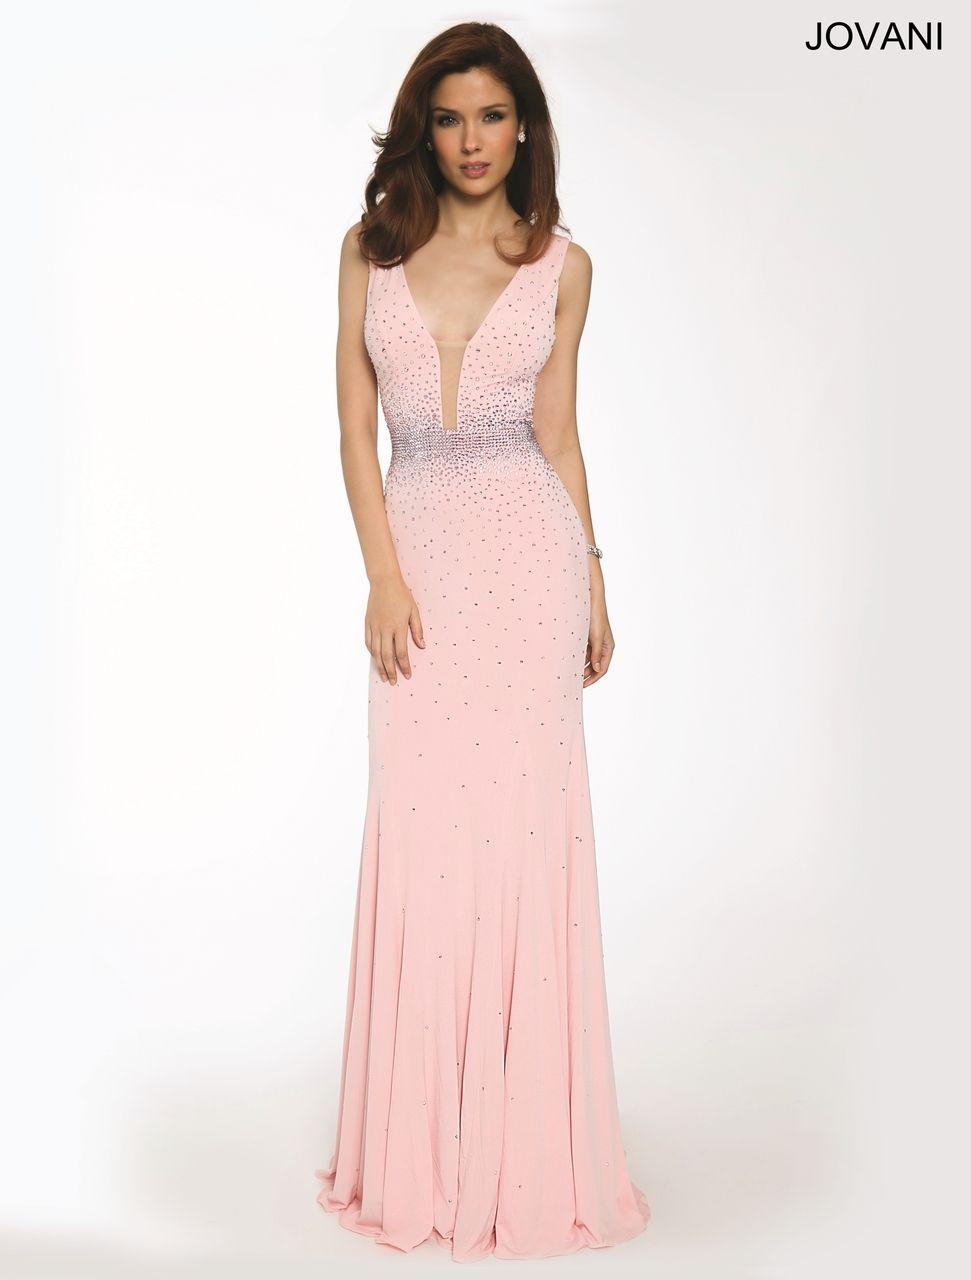 Jovani 22977 Aqua Green Light-pink Orange Evening Dress | Dresses ...